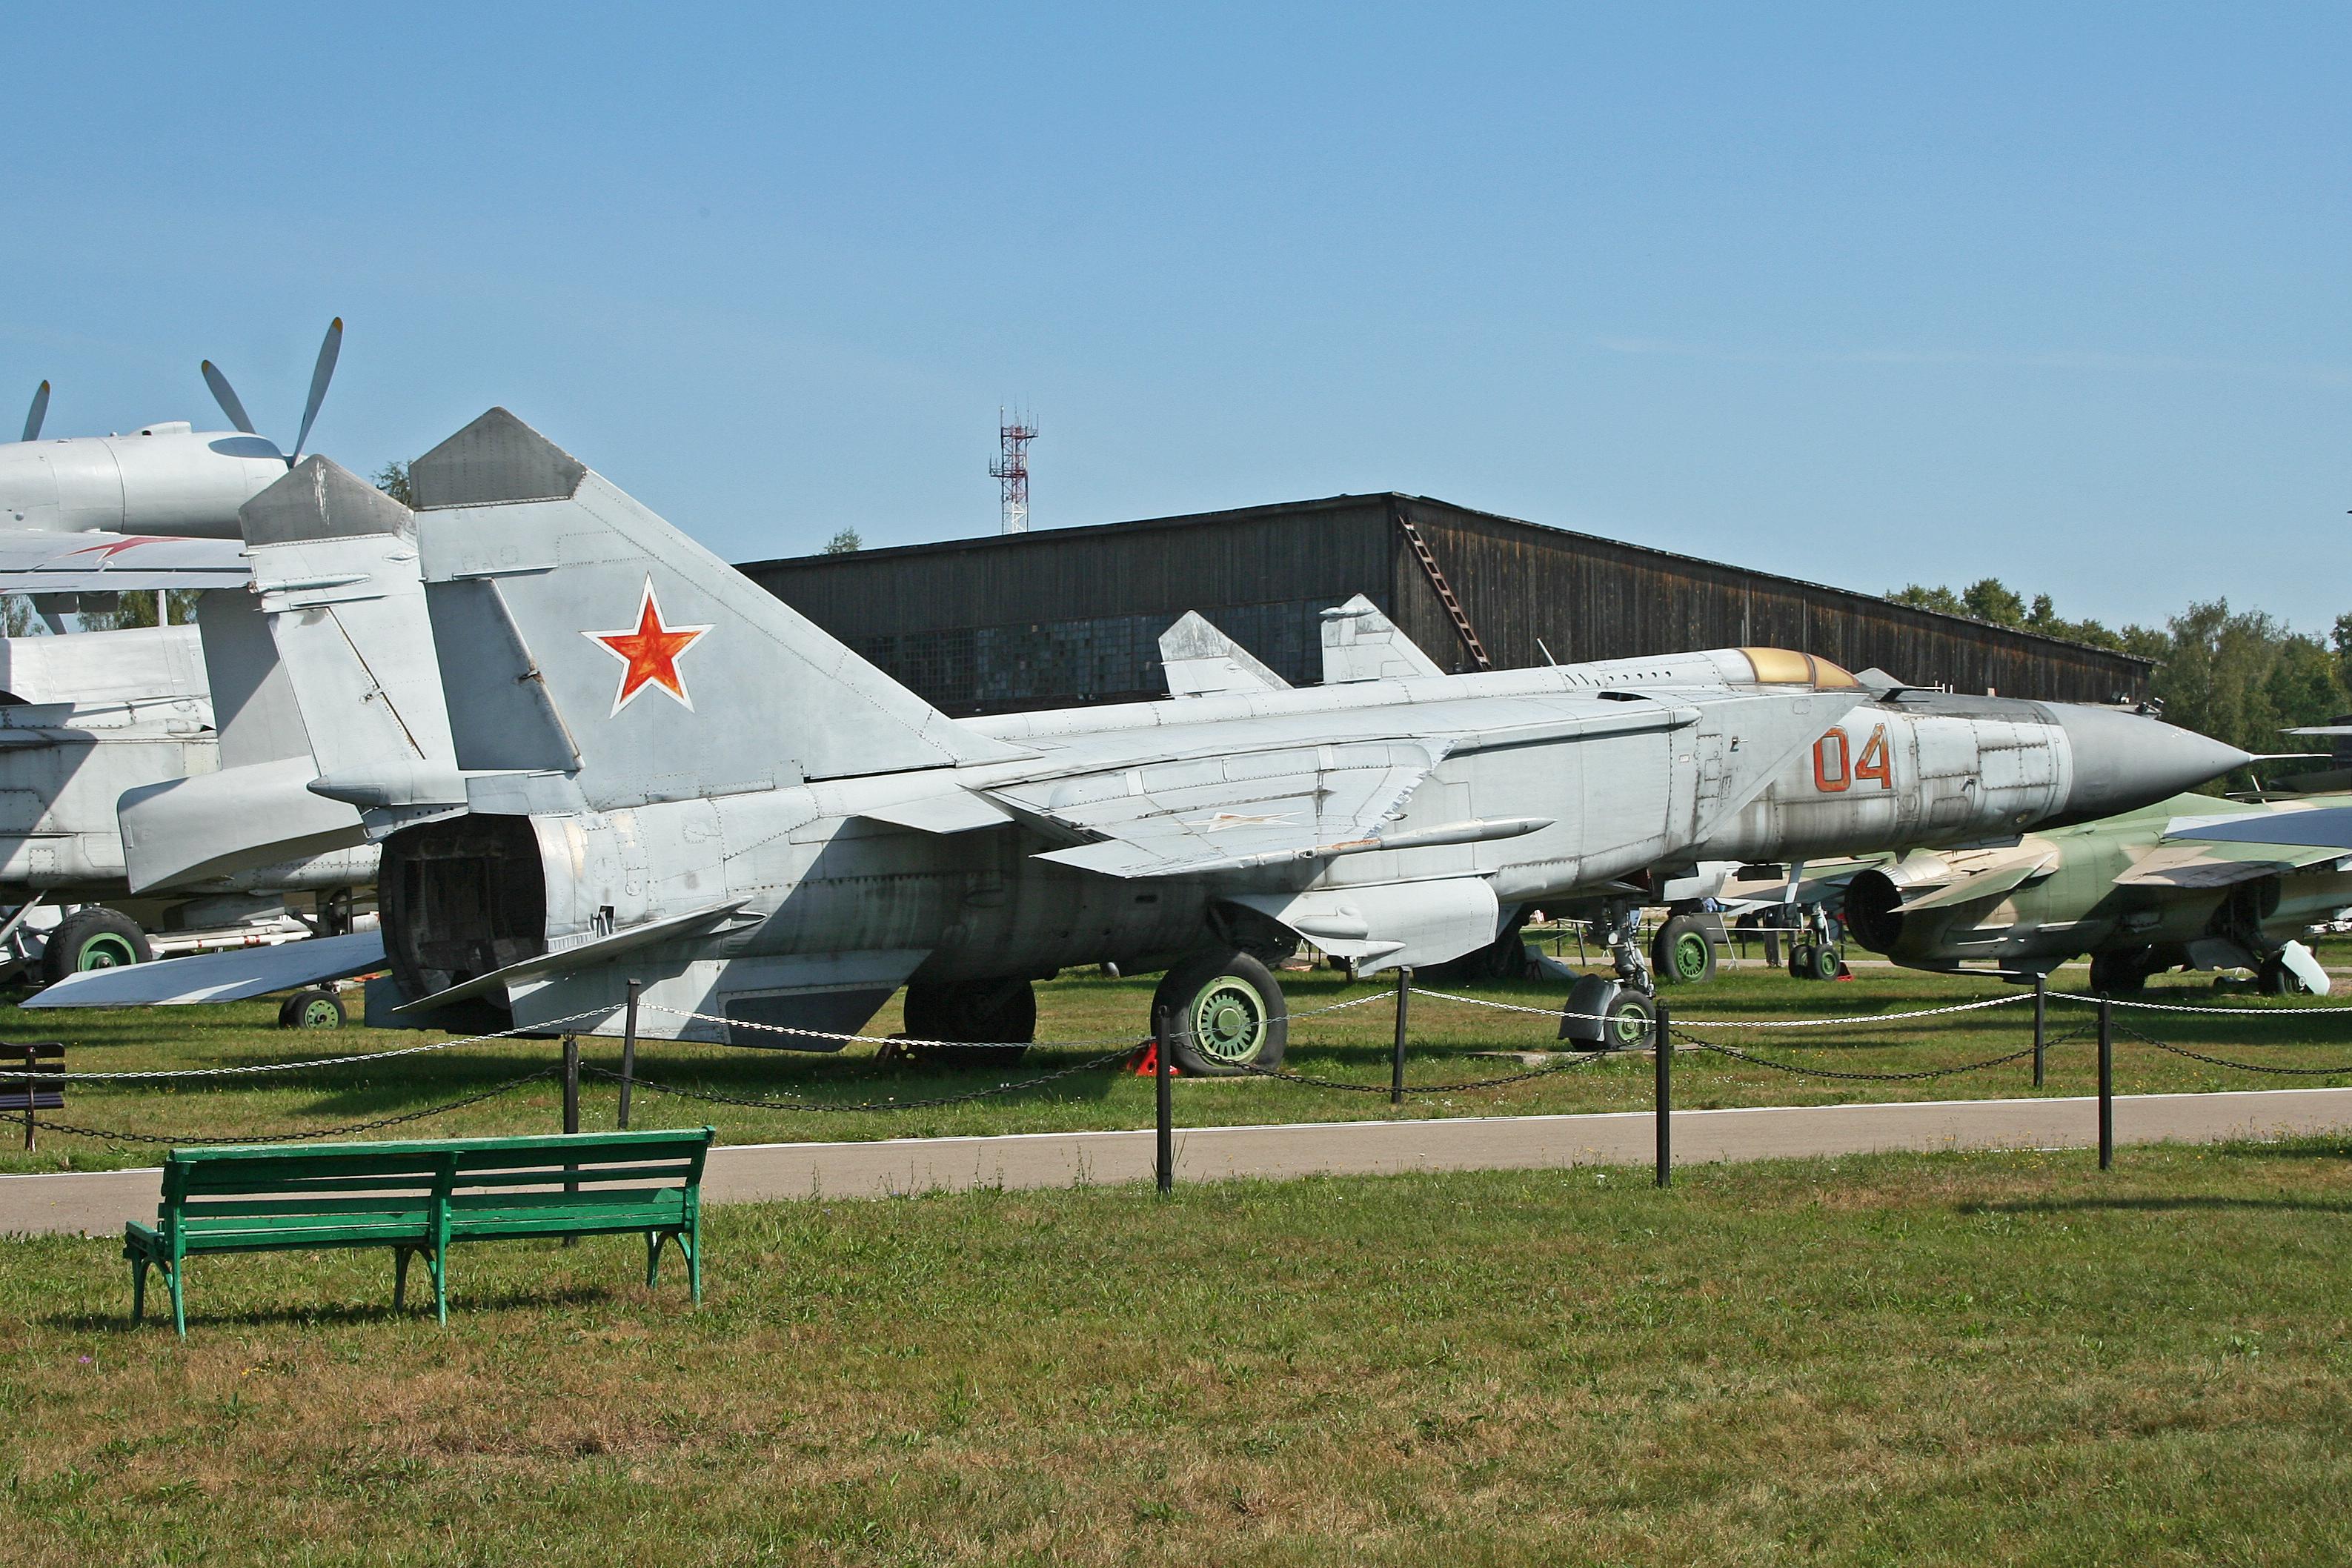 File:Mikoyan MiG-25PD Foxbat-E 04 red (10044659614).jpg - Wikimedia Commons